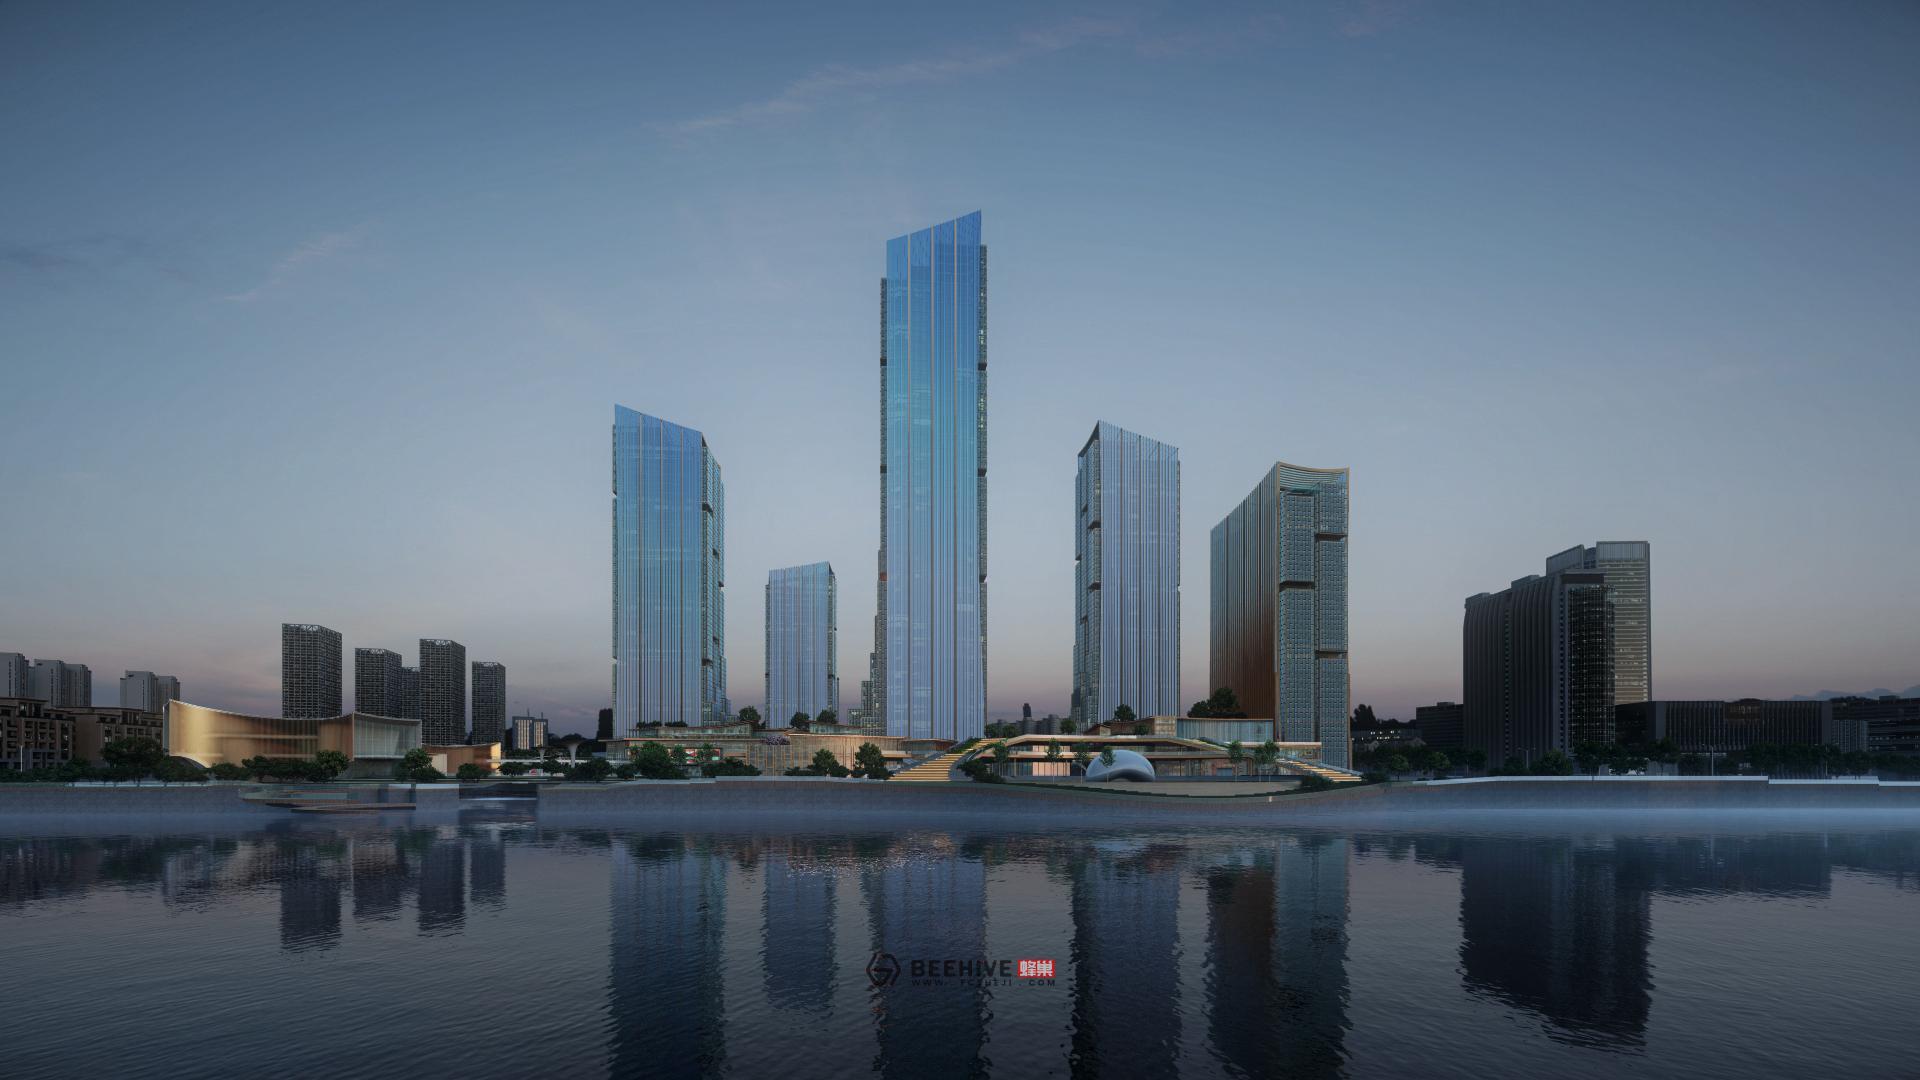 Hangzhou Fuyang Plot 73 Core Area Concept Design. Design by Aedas. Render by Beehive.